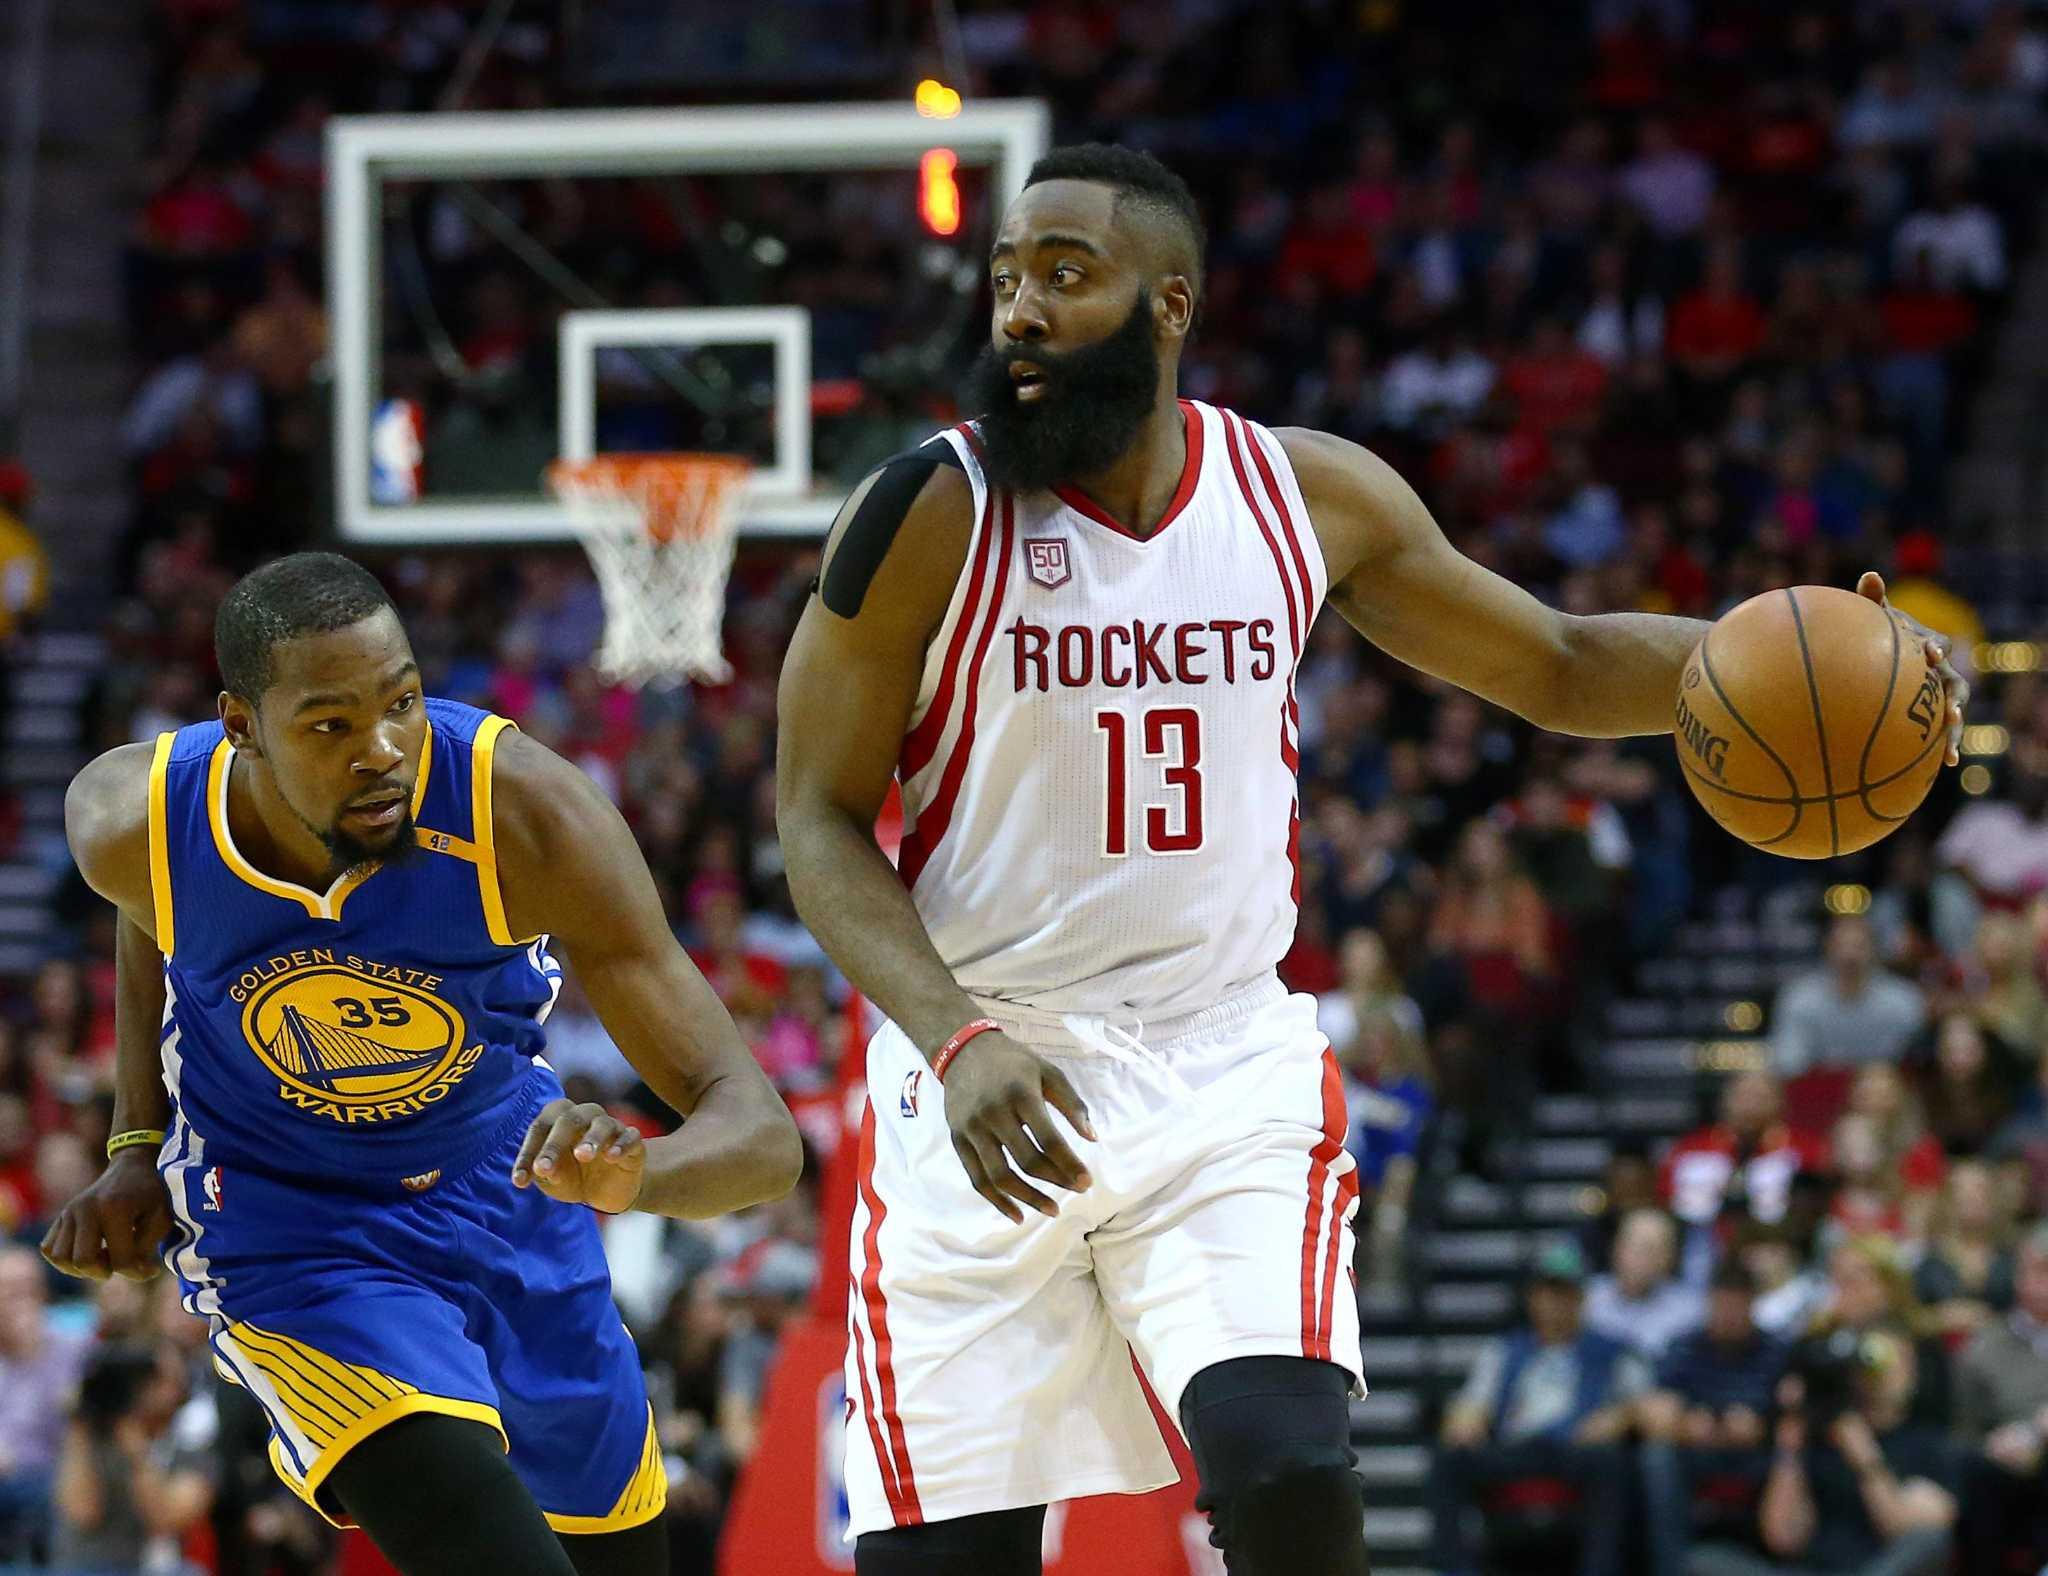 127955edddd7 TNT crew breaks down Rockets vs. Warriors matchup - Houston Chronicle